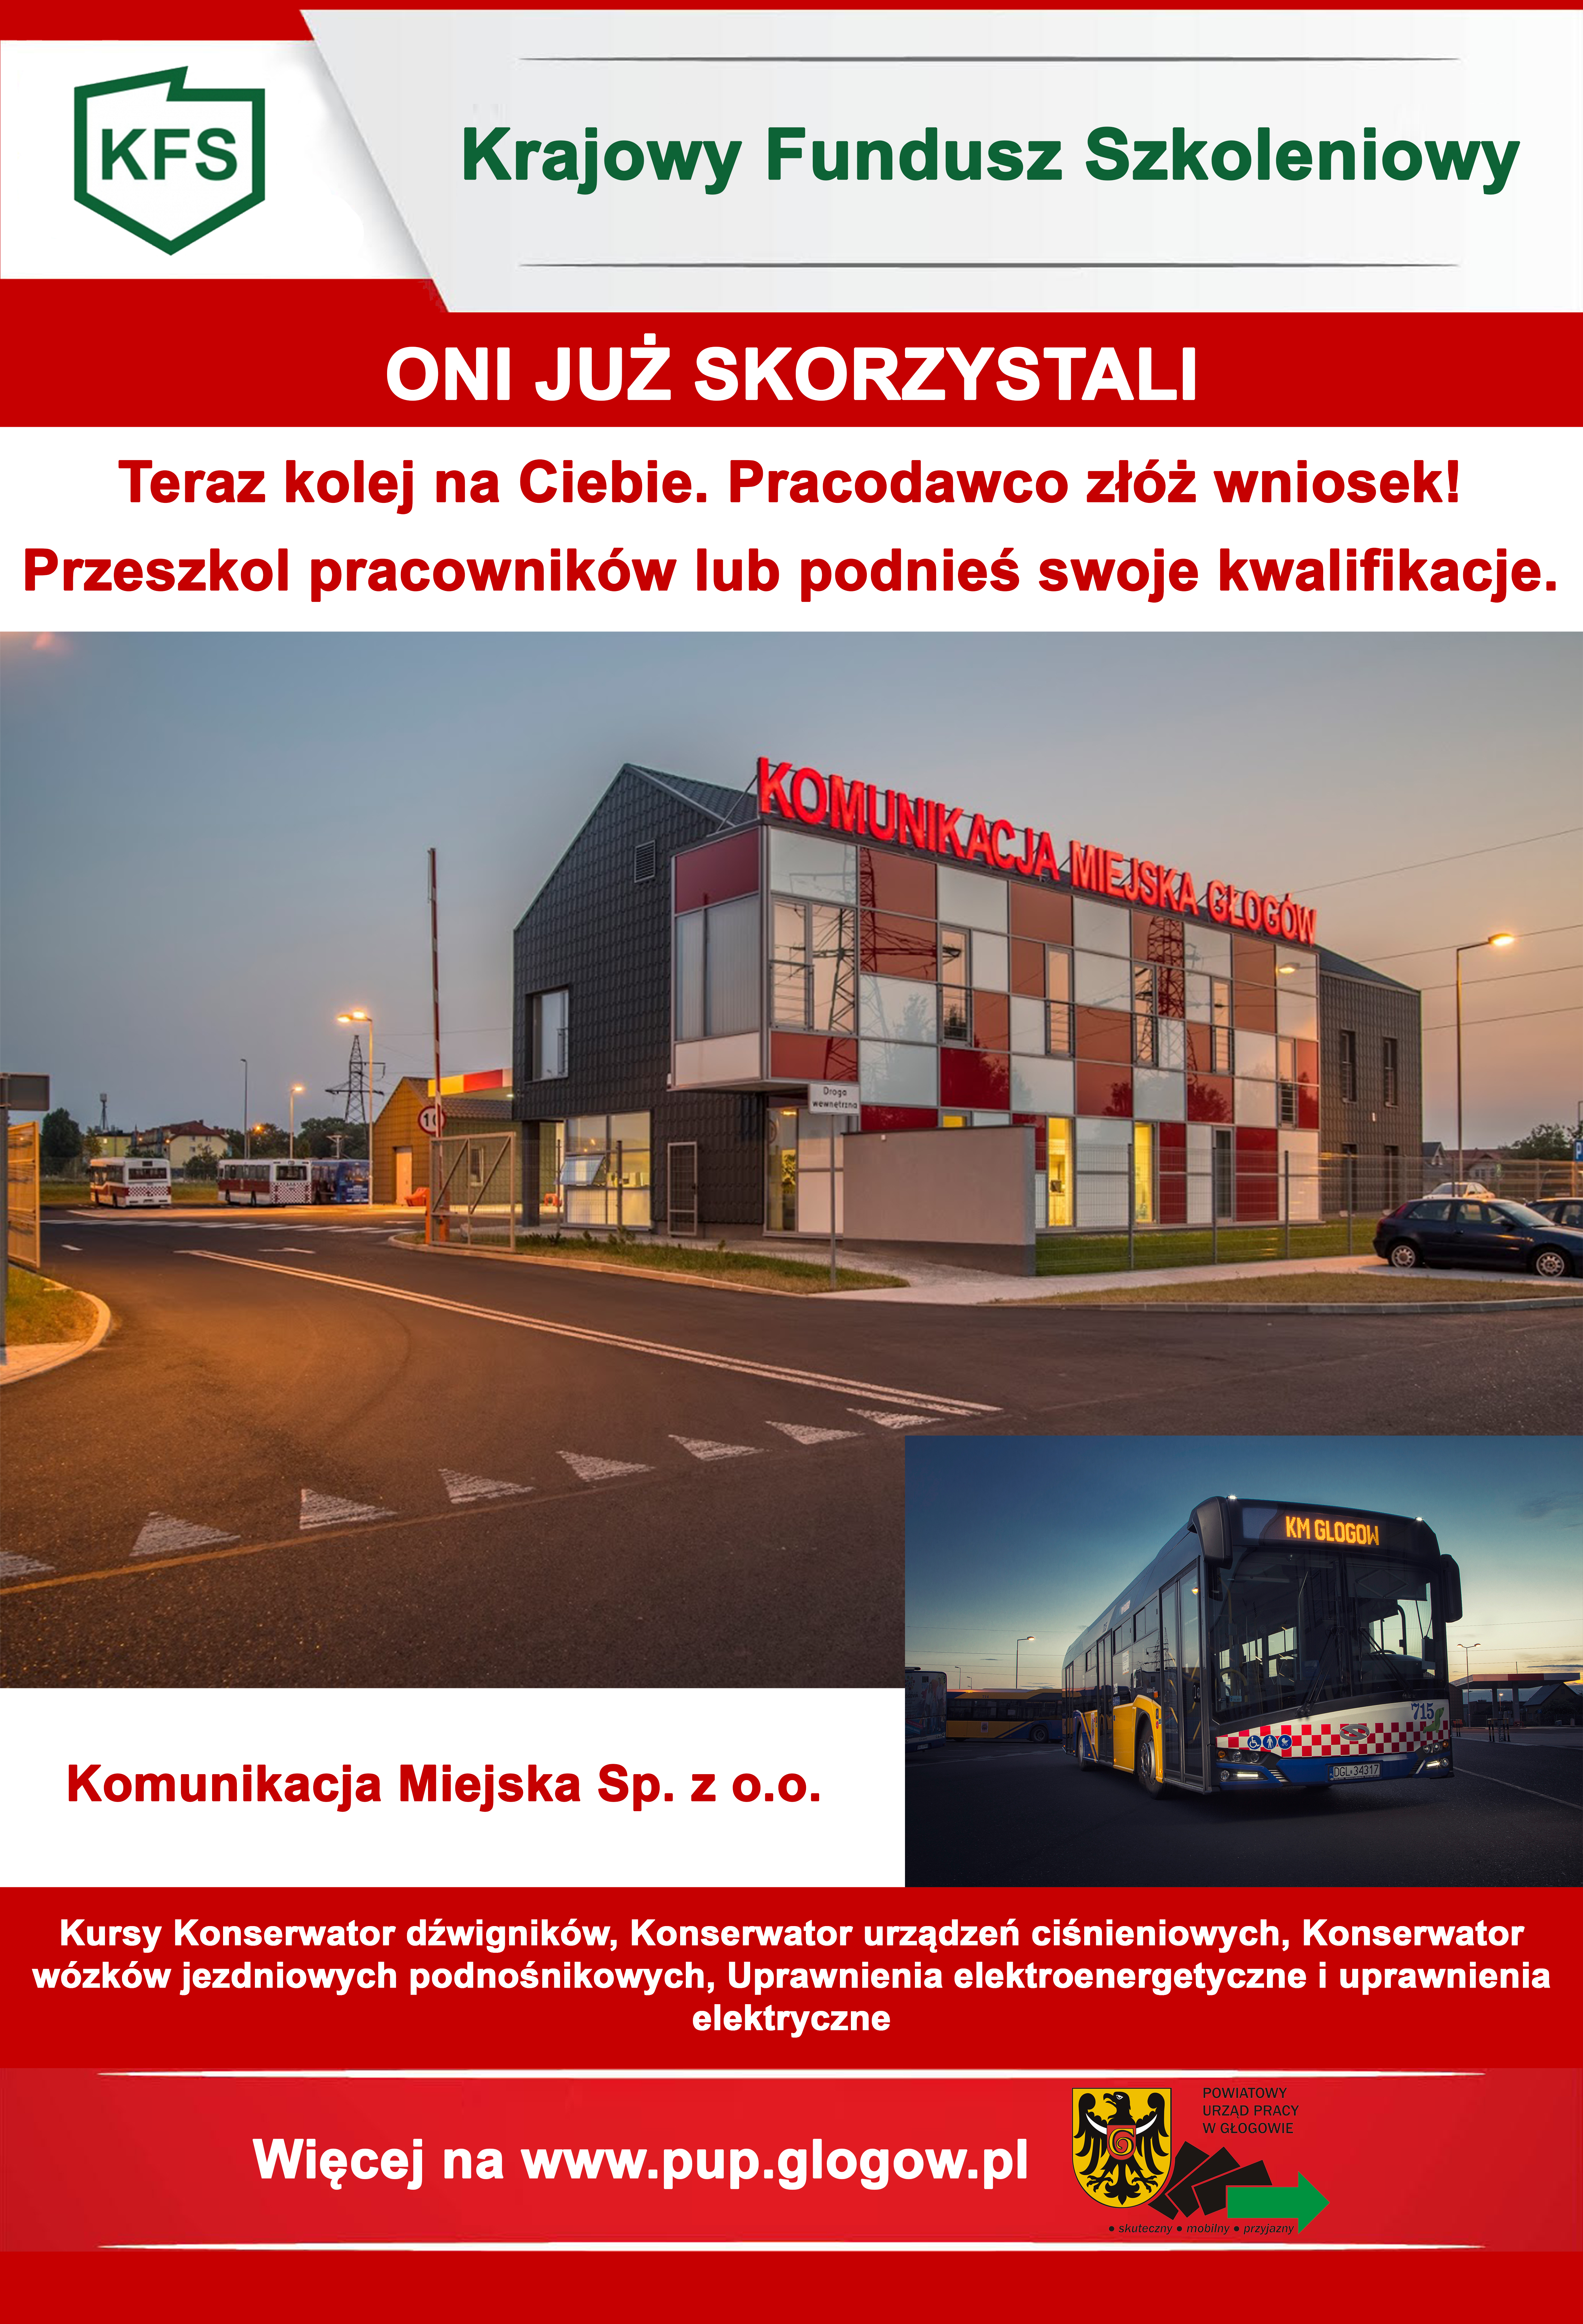 KFS - reklama firmy